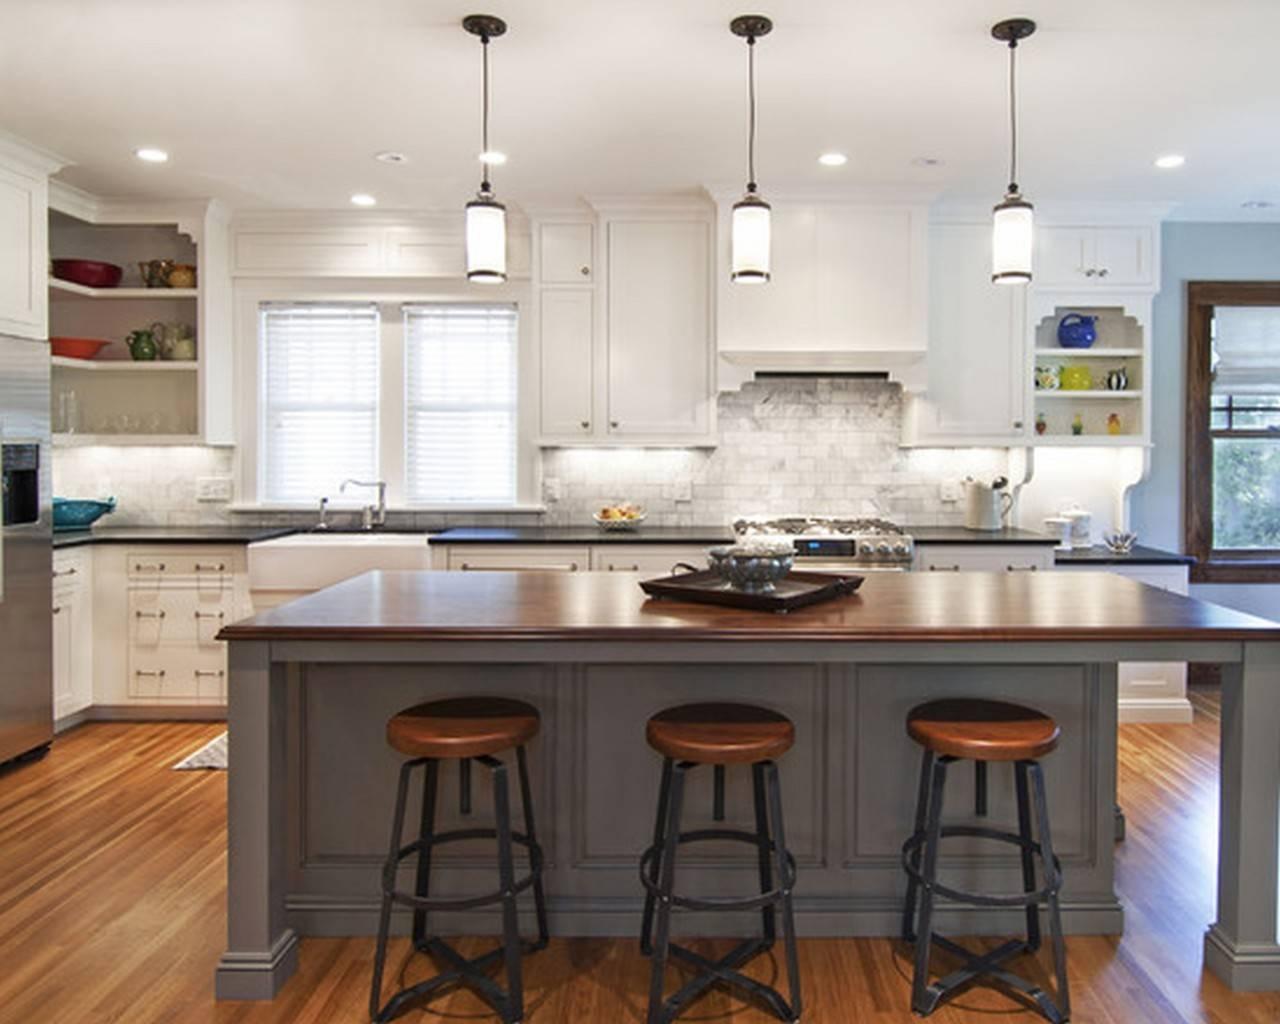 Kitchen Island Pendant Lighting White : Kitchen Island Pendant With Glass Kitchen Pendant Lights (View 6 of 15)